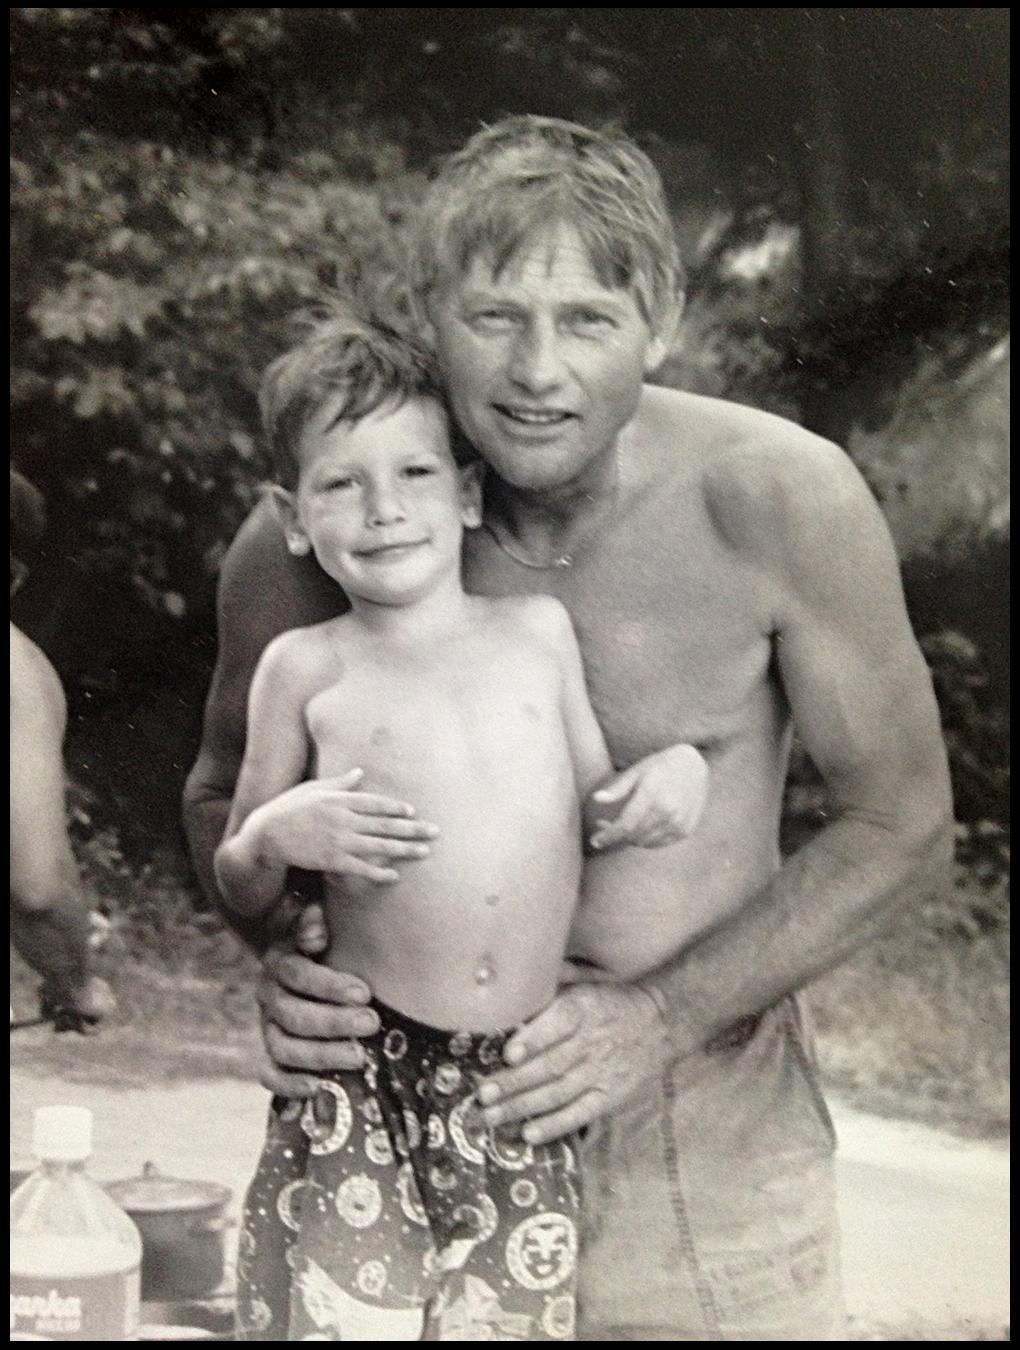 Matt and Grand daddy Hank